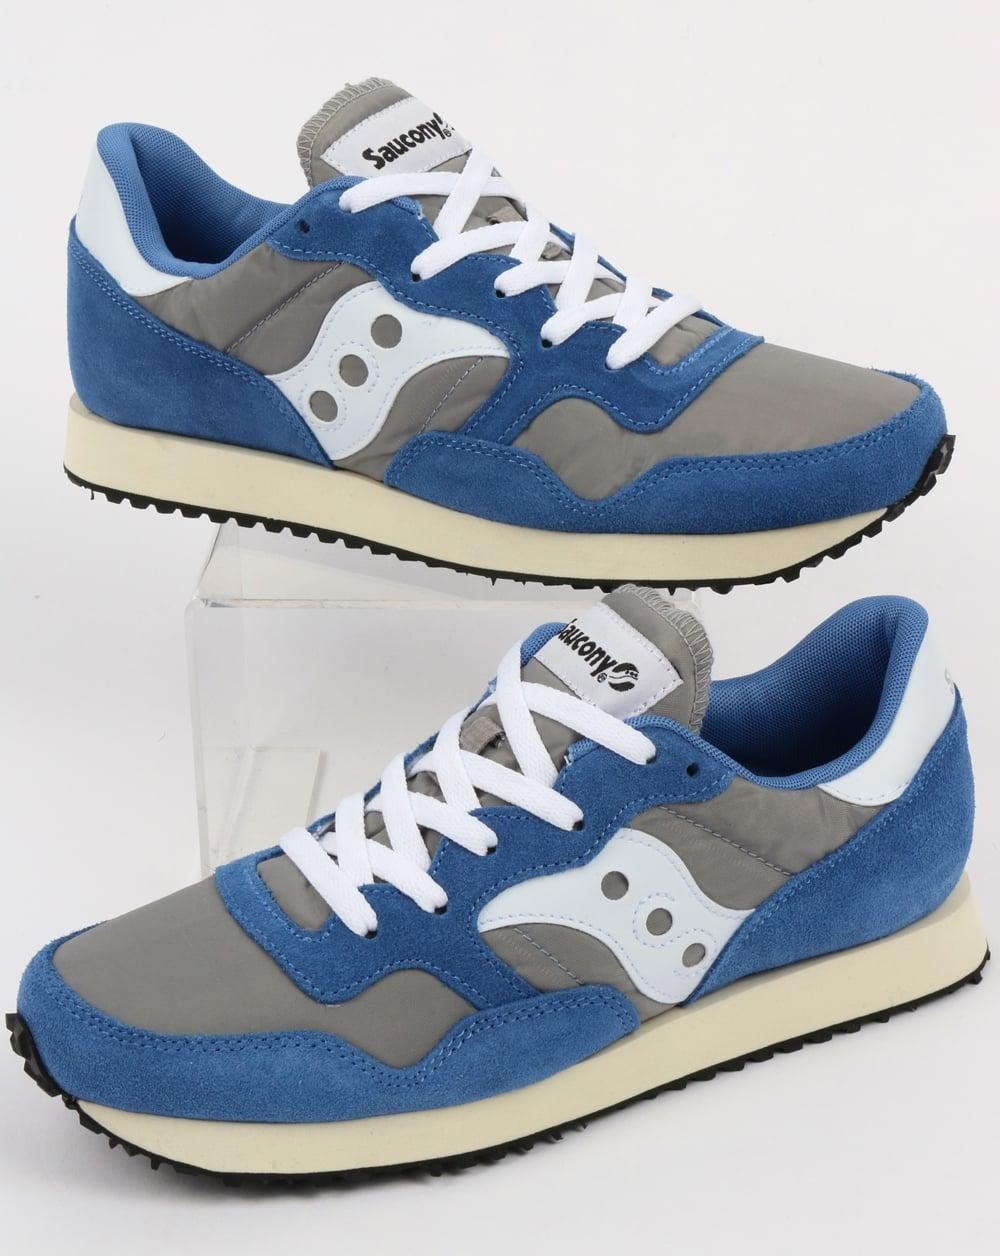 Saucony DXN Vintage Trainers Grey/Blue